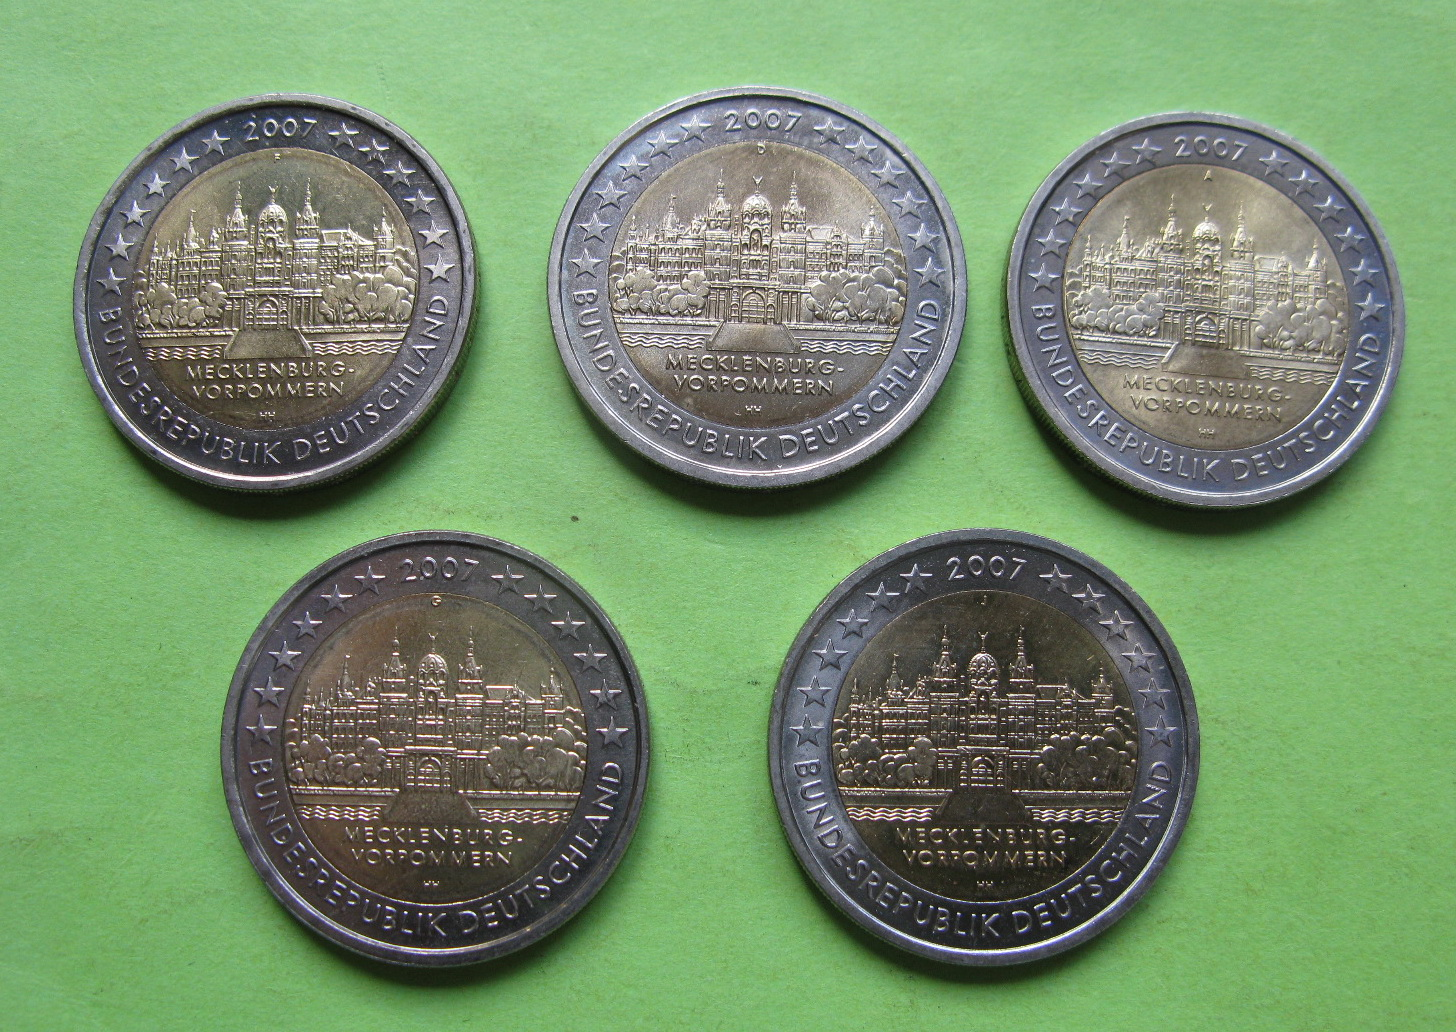 Германия 2 евро 2007 г. Мекленбург-Передняя Померания ( A,D,F,G,J ) , UNC